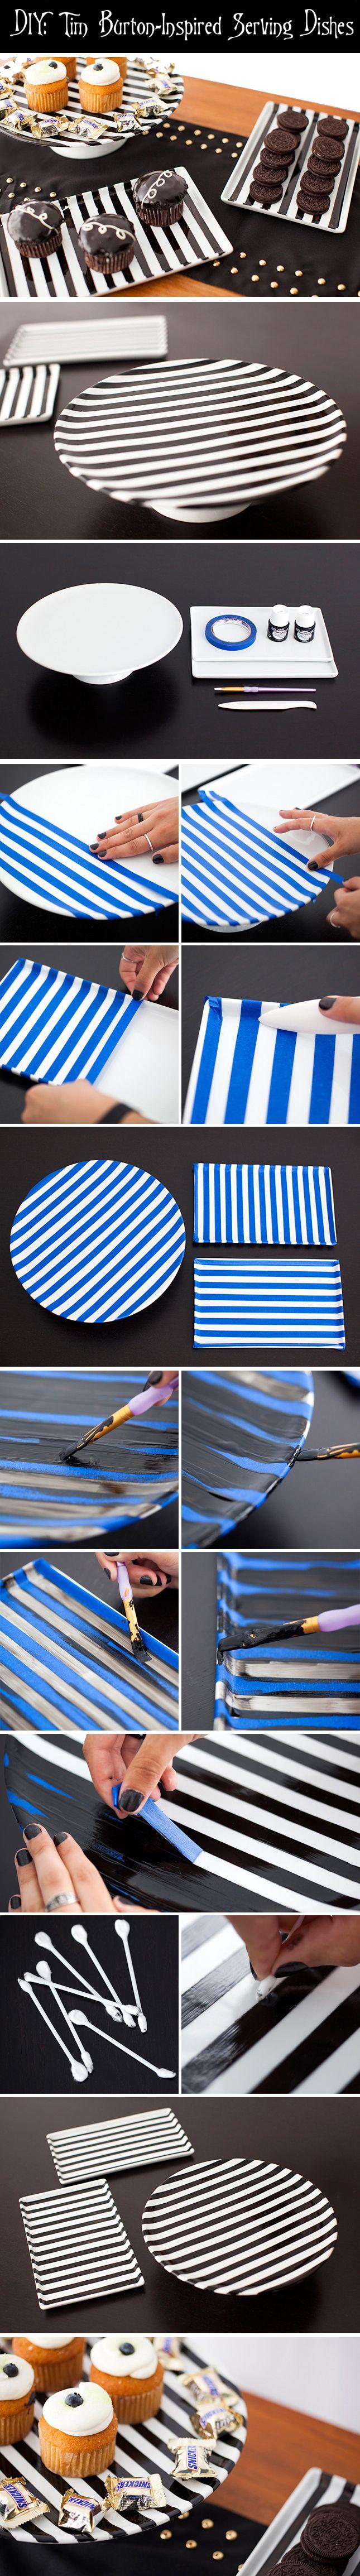 Very Burton-esque.  Important:  must use non-toxic porcelain paint, like Pebeo Porcelaine 150 paint. Halloween with Tim Burton ~~ Halloween Party Decorations & Ideas